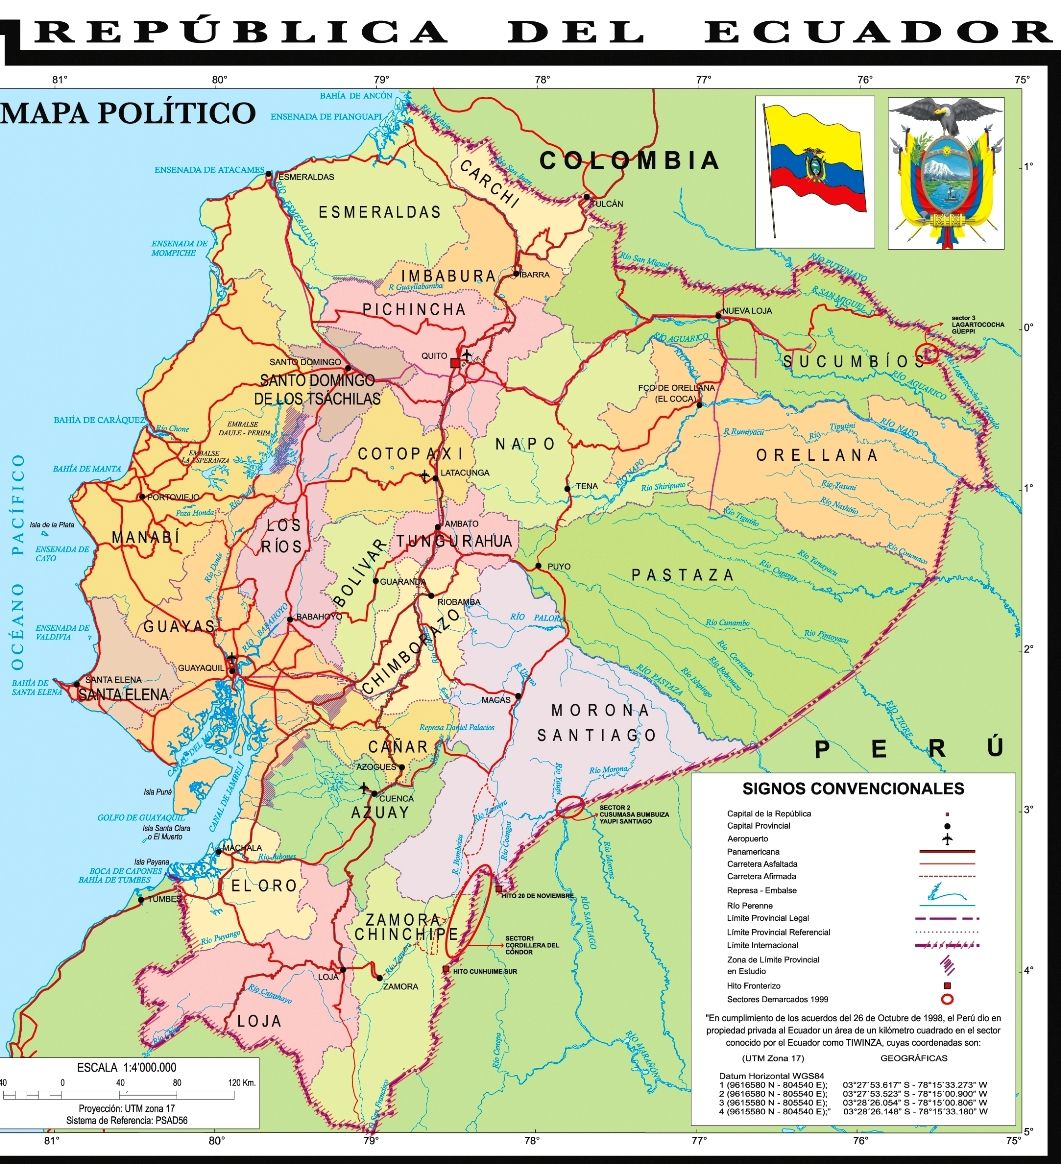 Acta del 6 de Julio de 1936 Ecuador | Onlyforyoung Ecuador | My ...